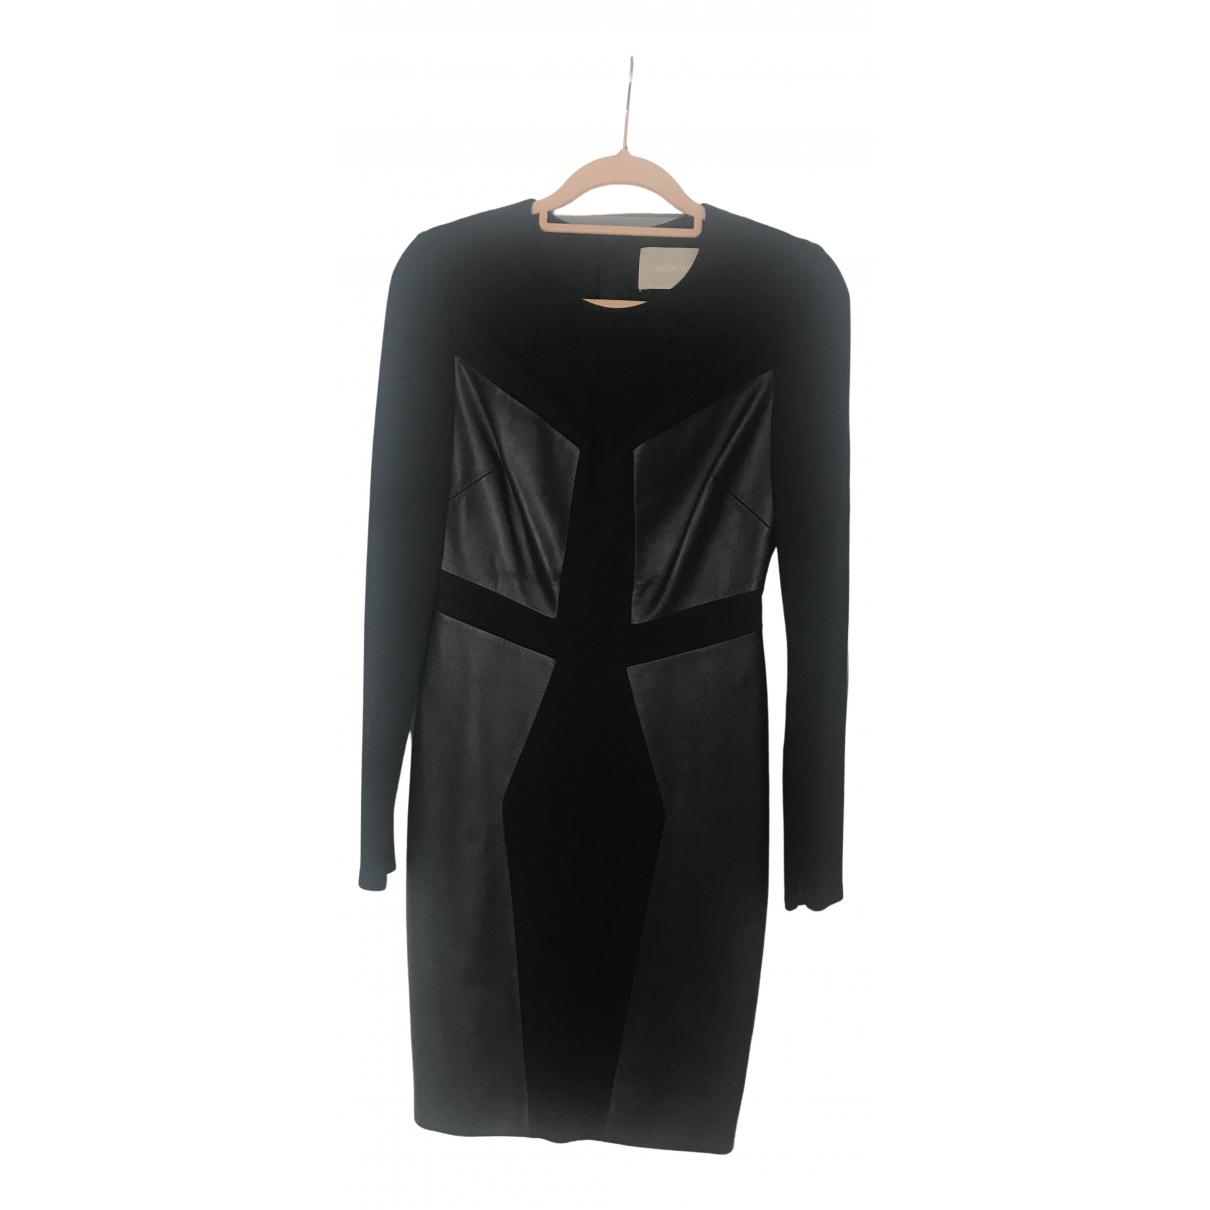 Jason Wu \N Kleid in  Schwarz Baumwolle - Elasthan